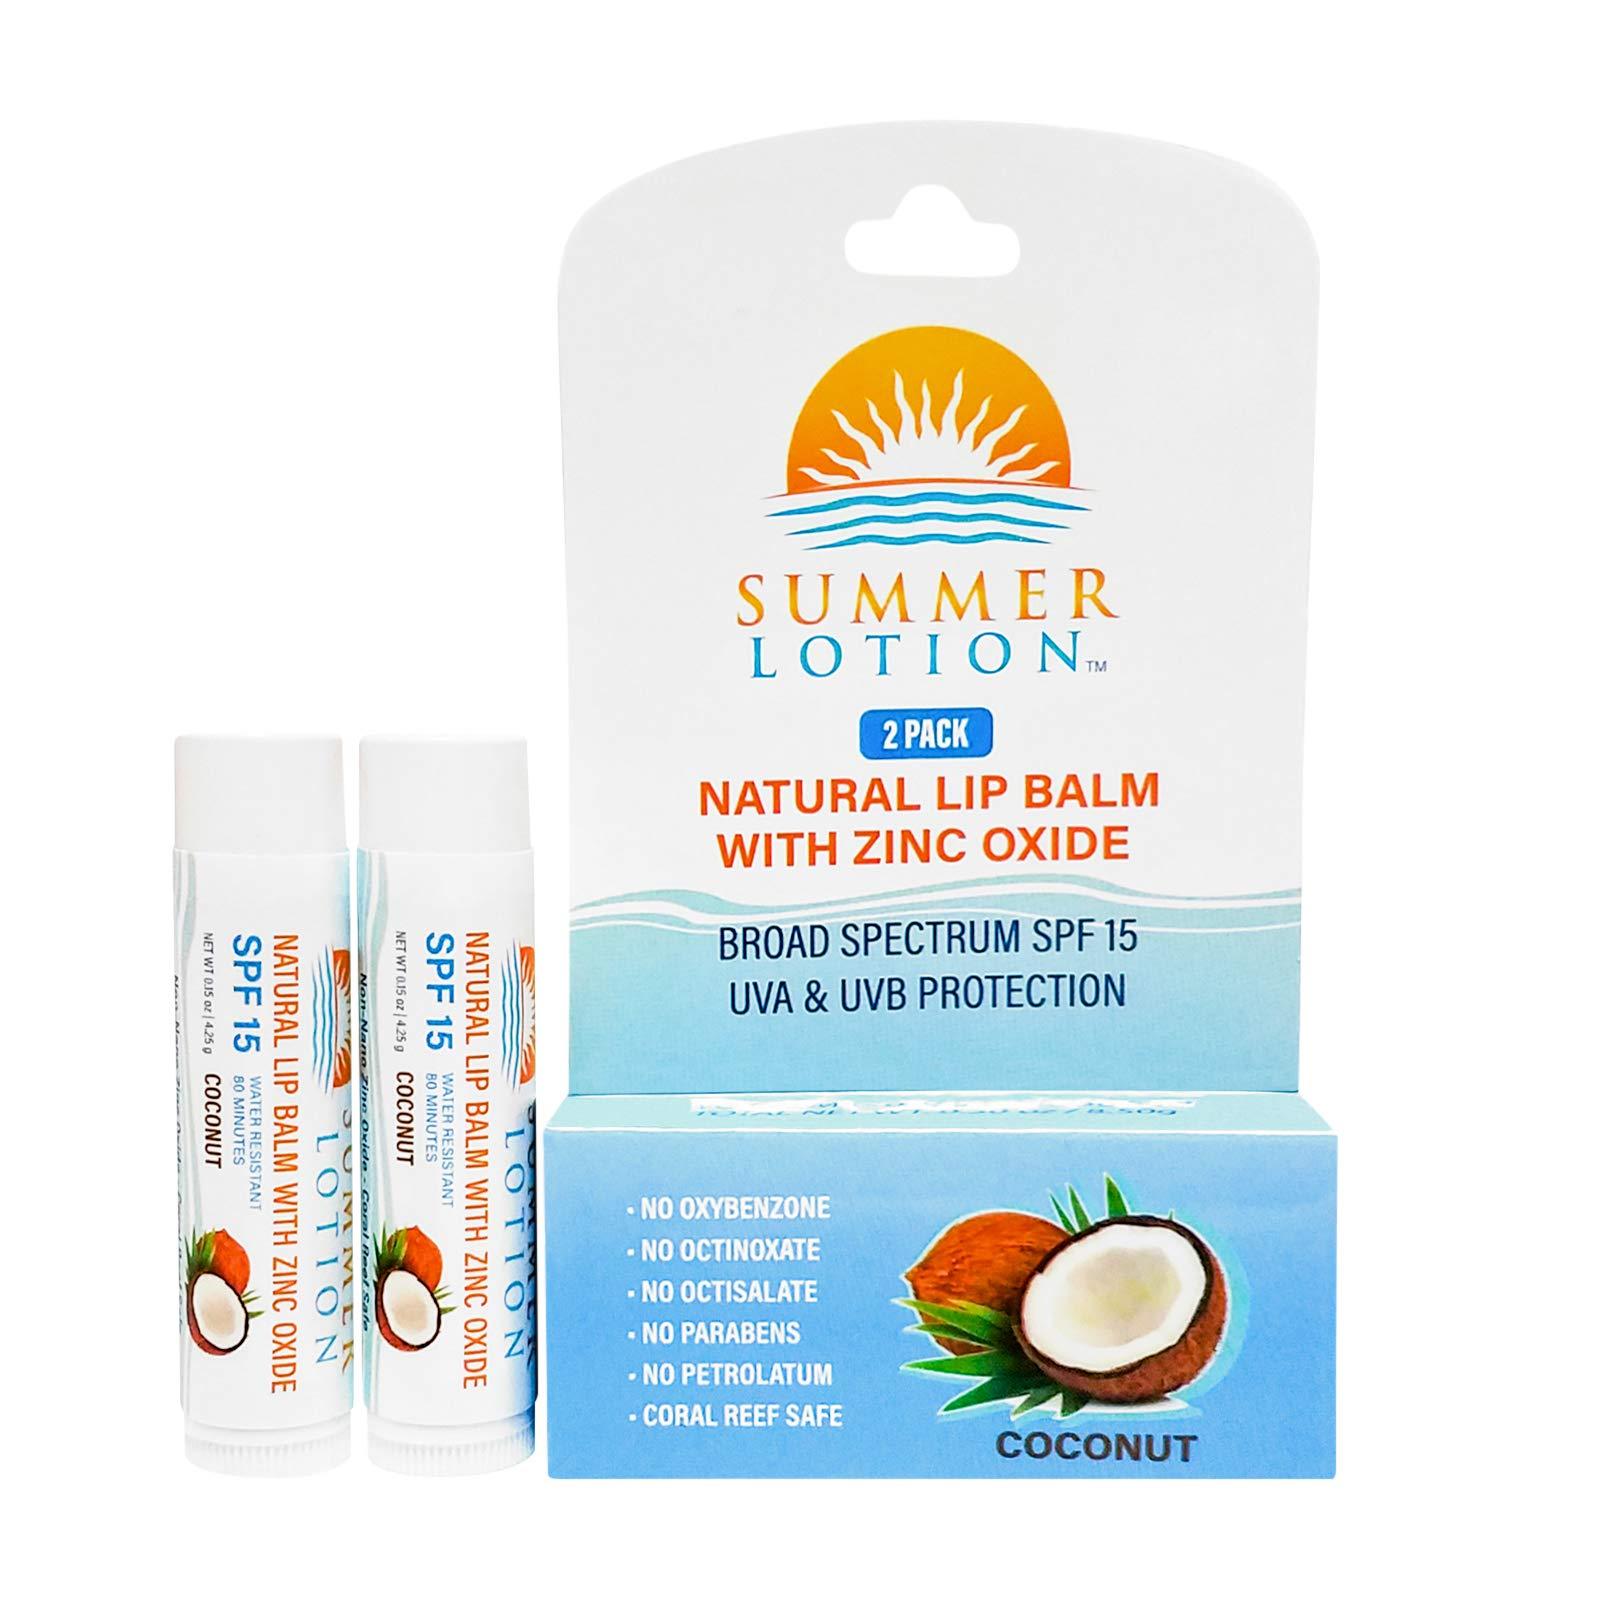 Summer Lotion - Natural Lip Balm with Zinc Oxide Sunblock, SPF 15 Lip Sunscreen, Coconut Flavor, (2-Pack)